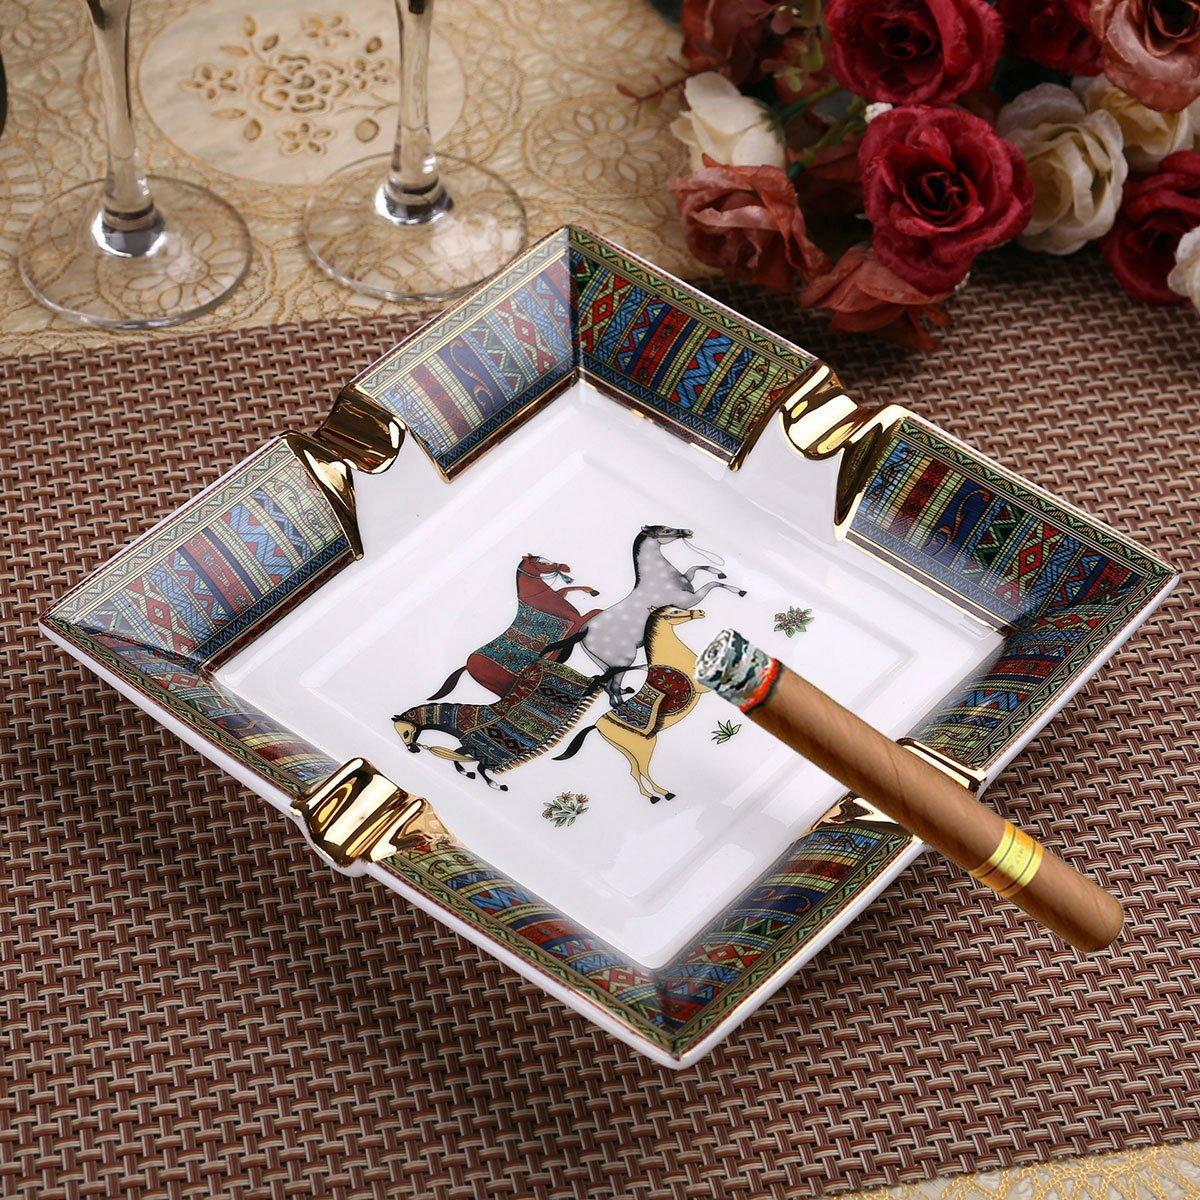 Scotte European style ceramic cigar ashtray top grade Luxury ashtray creative living room KTV Furnishing articles